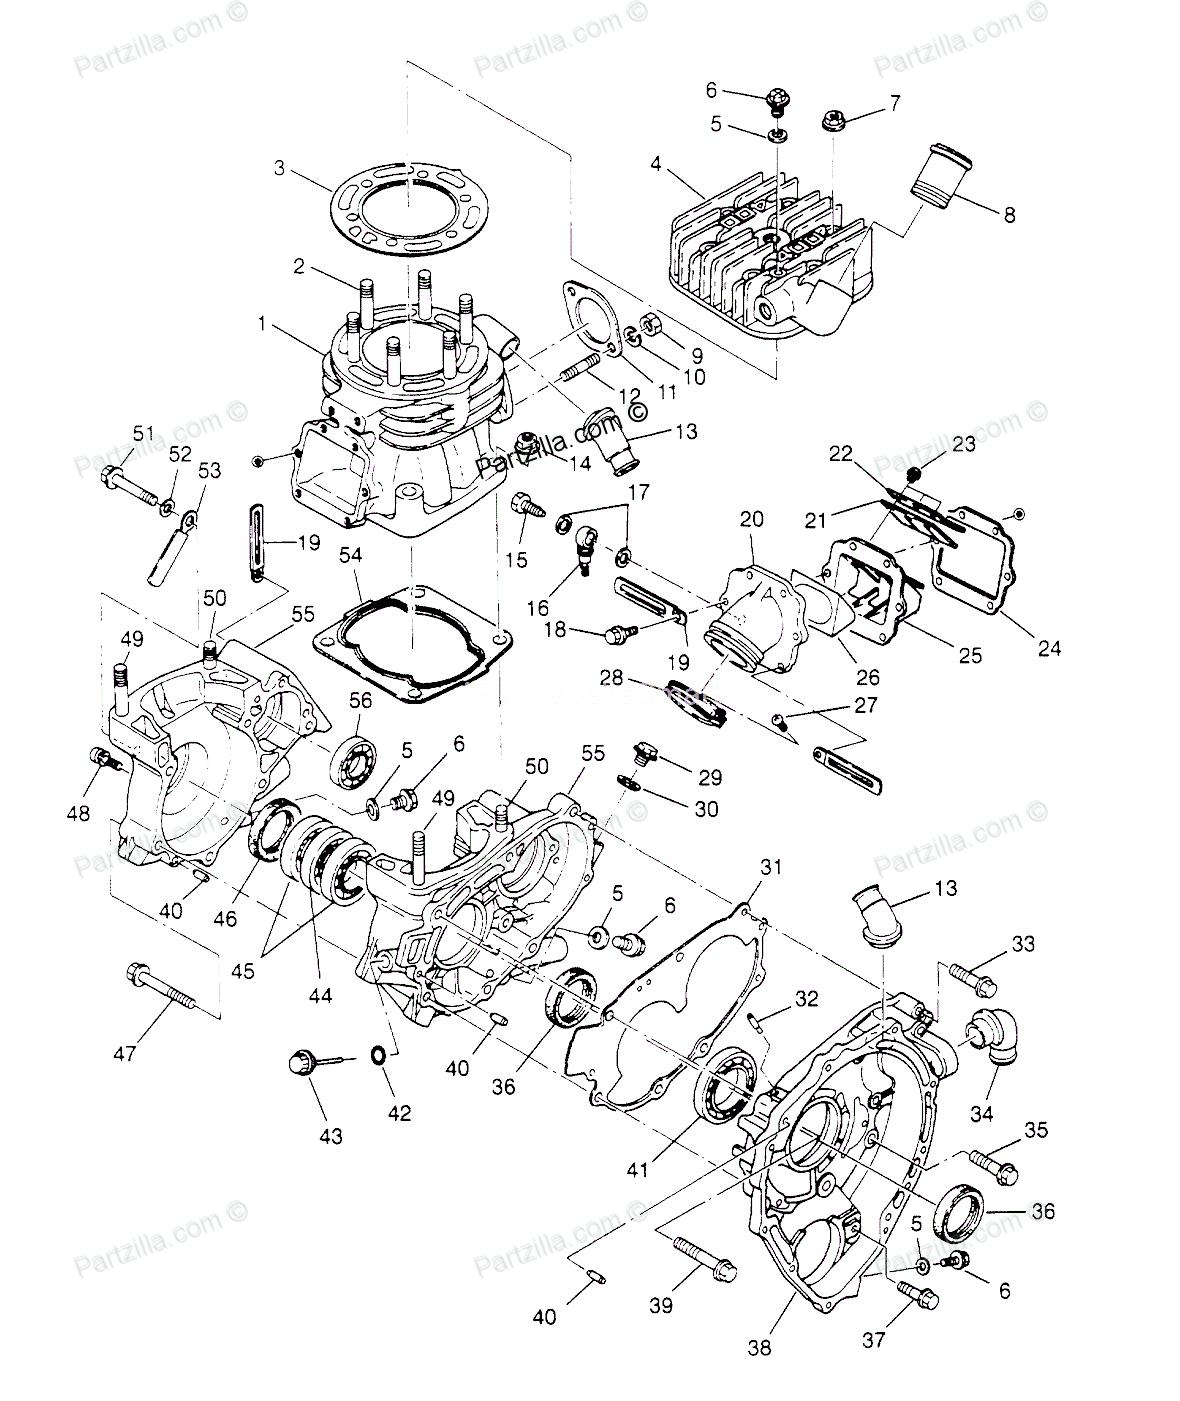 Polaris Scrambler 400 Transmission Fluid Change